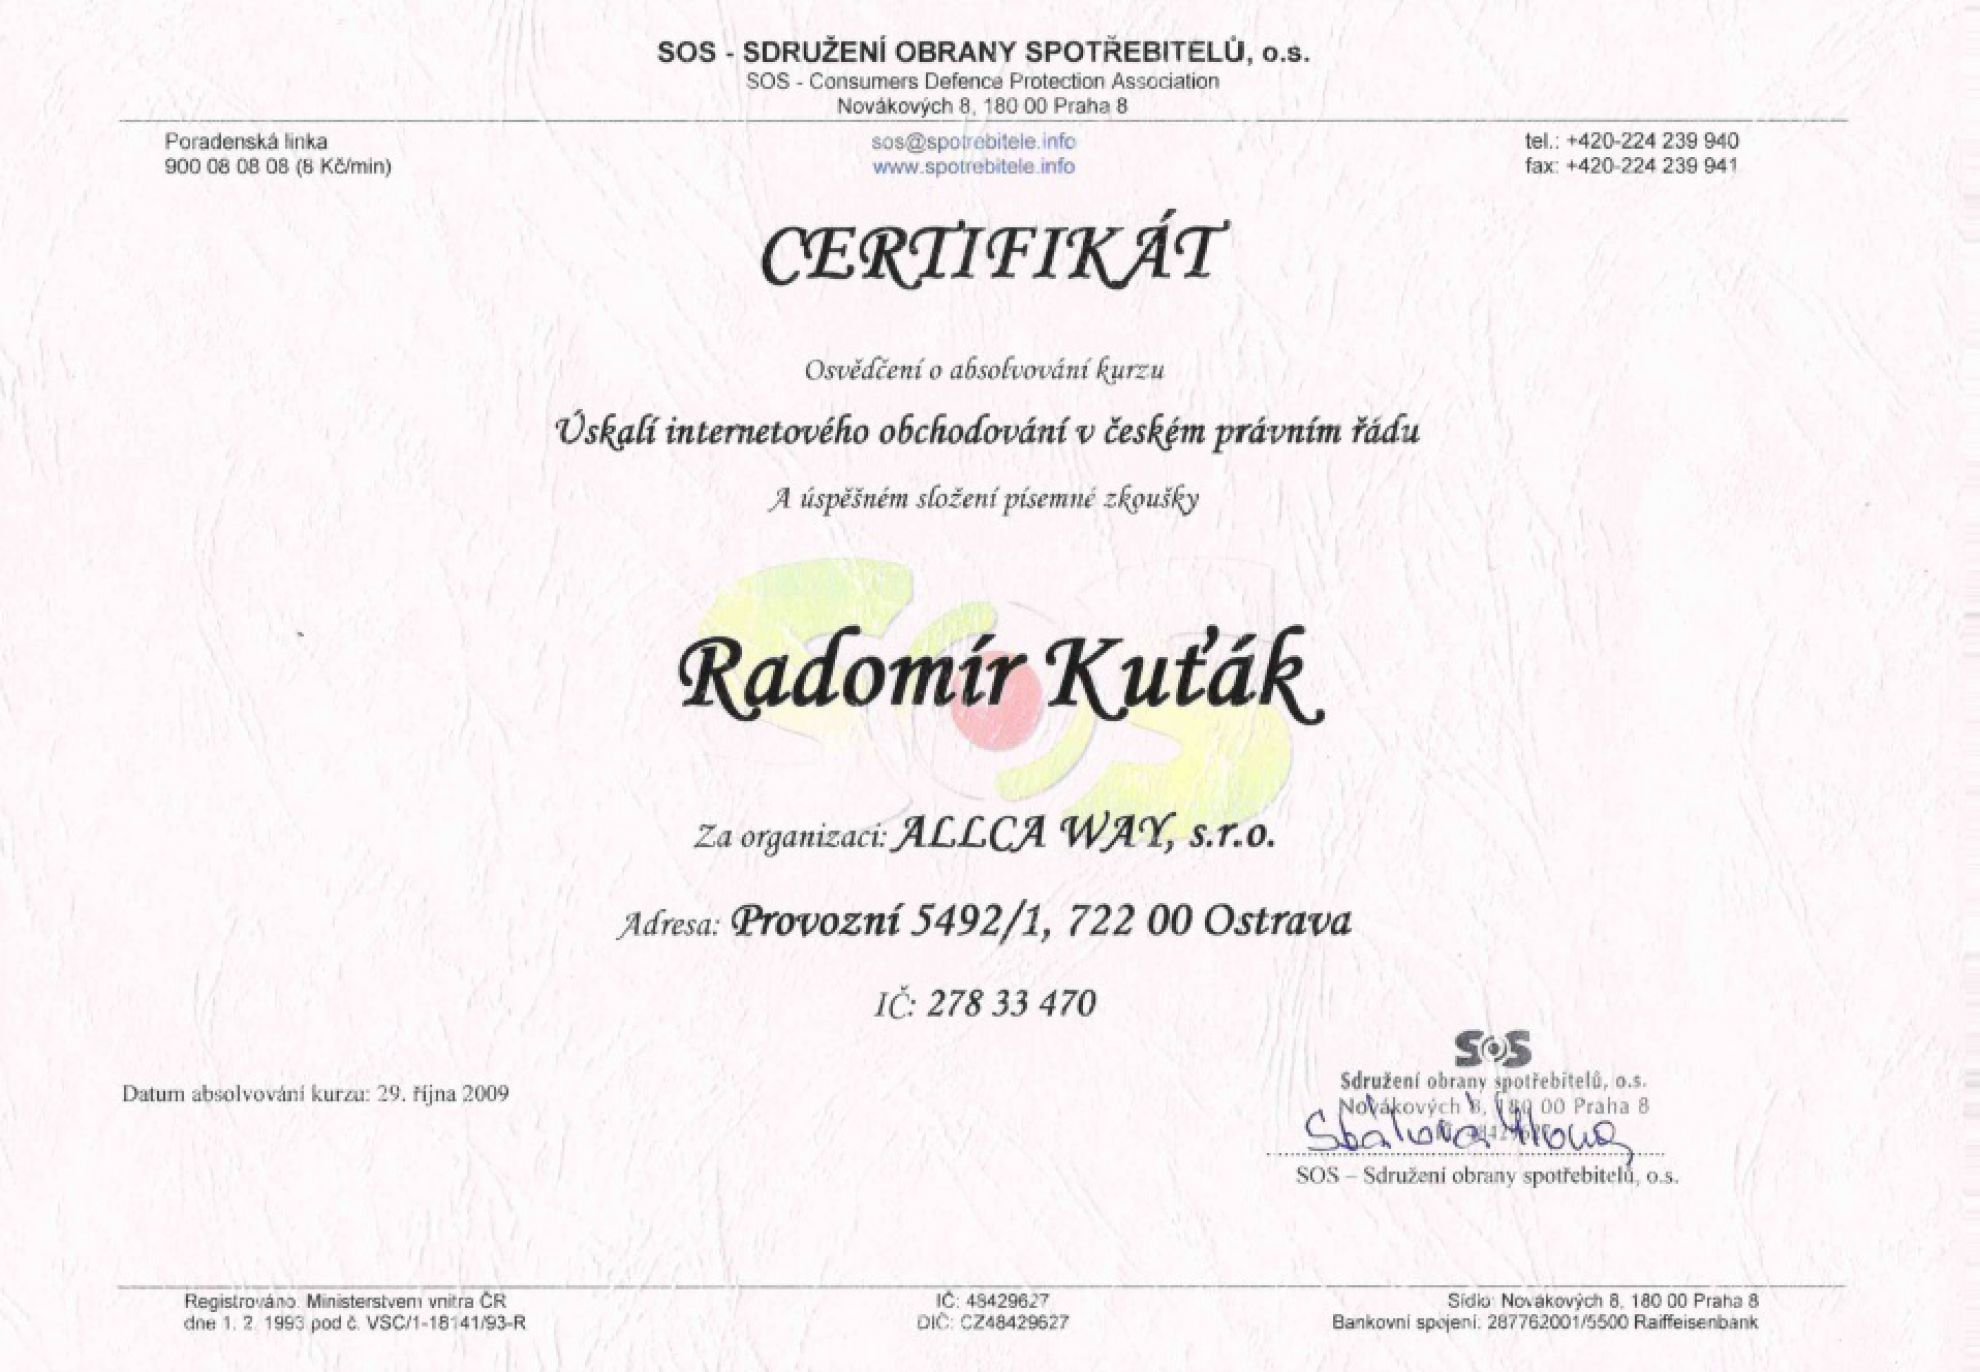 certifikát od SOS